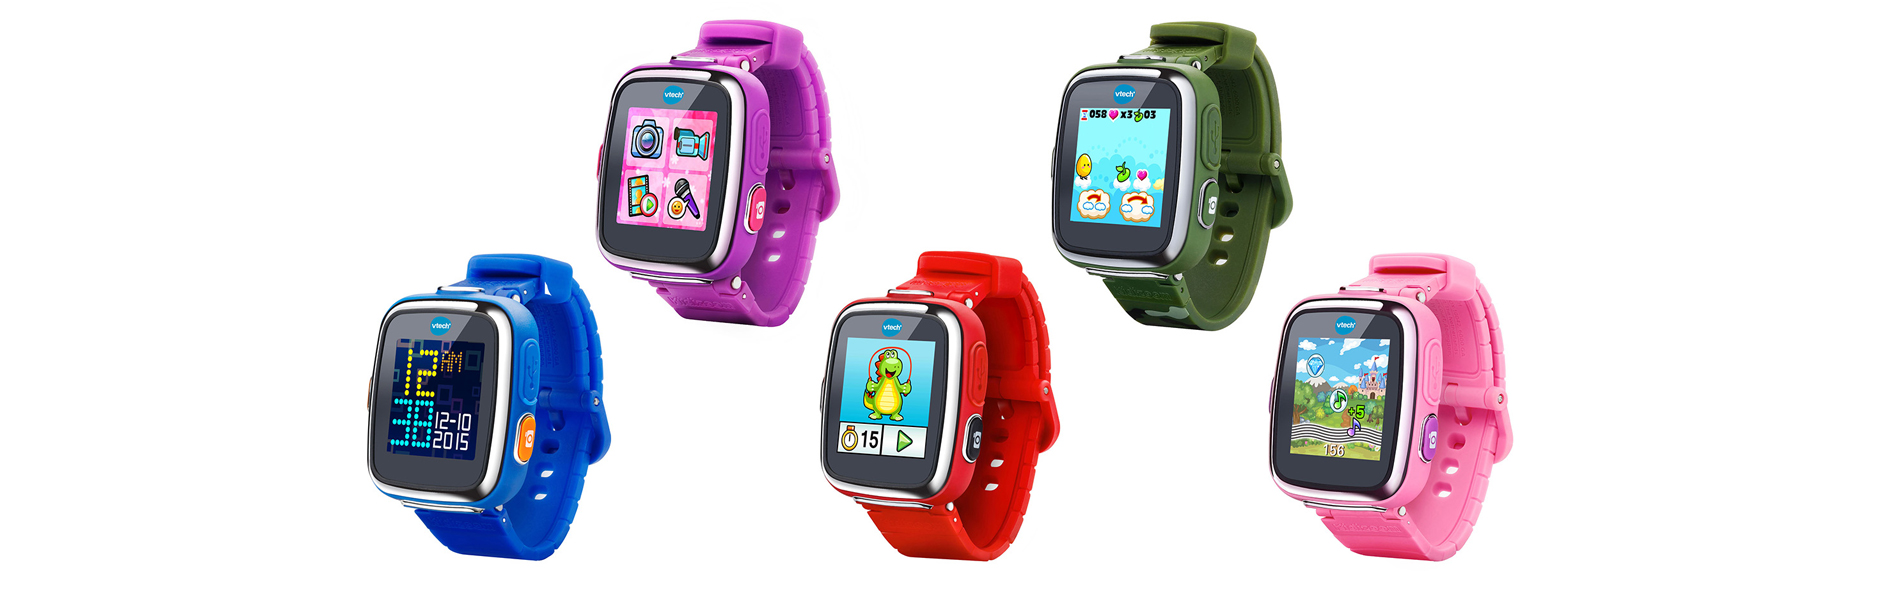 Smartest Watch for Kids Gets Even Smarter with VTech®'s Kidizoom® Smartwatch DX